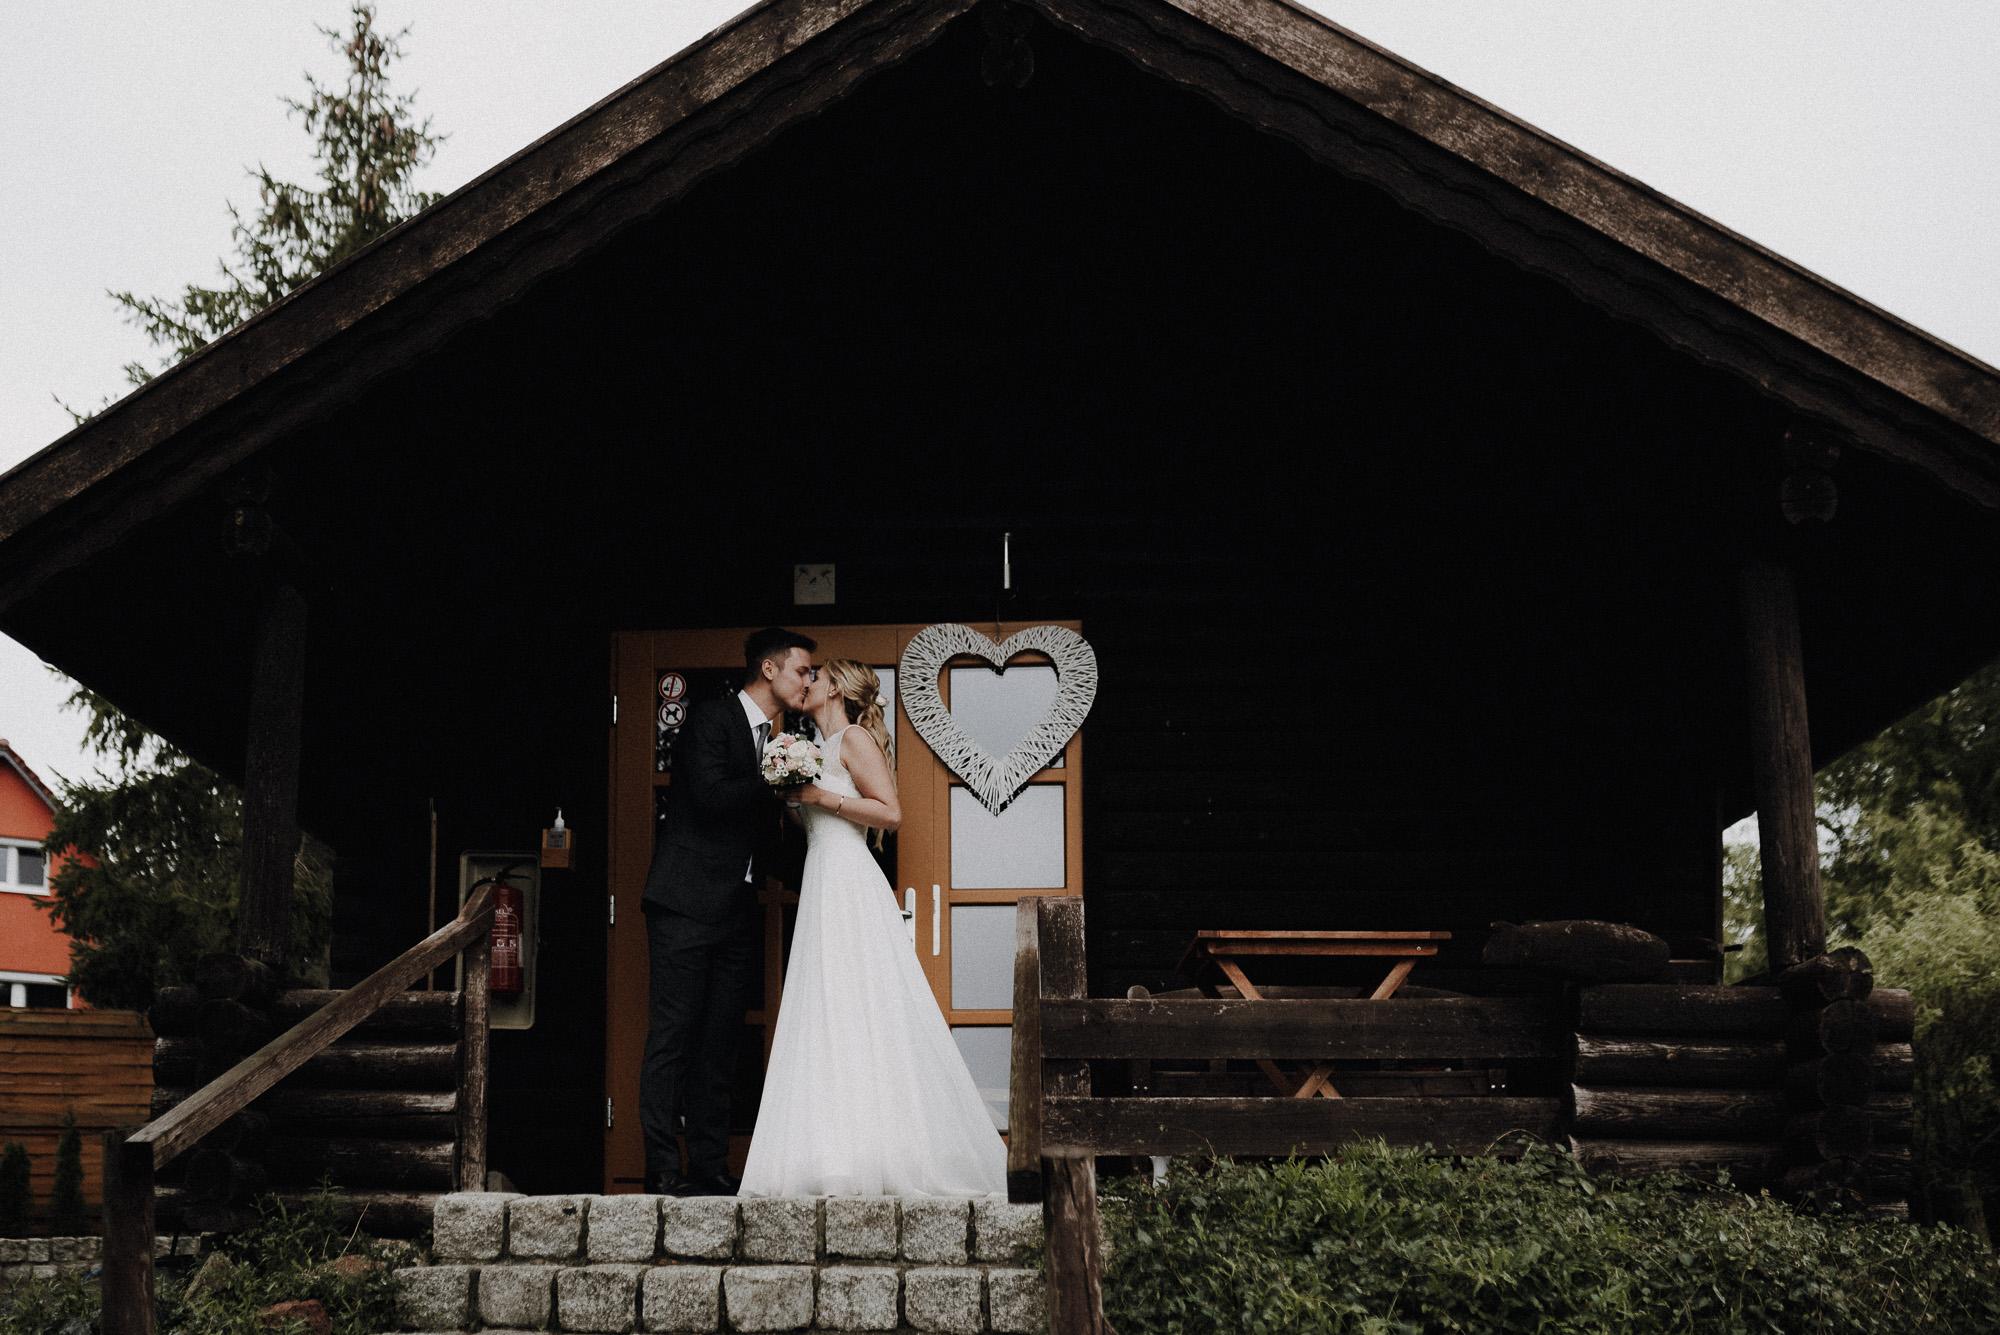 waltsmedia_weddingstorys-14